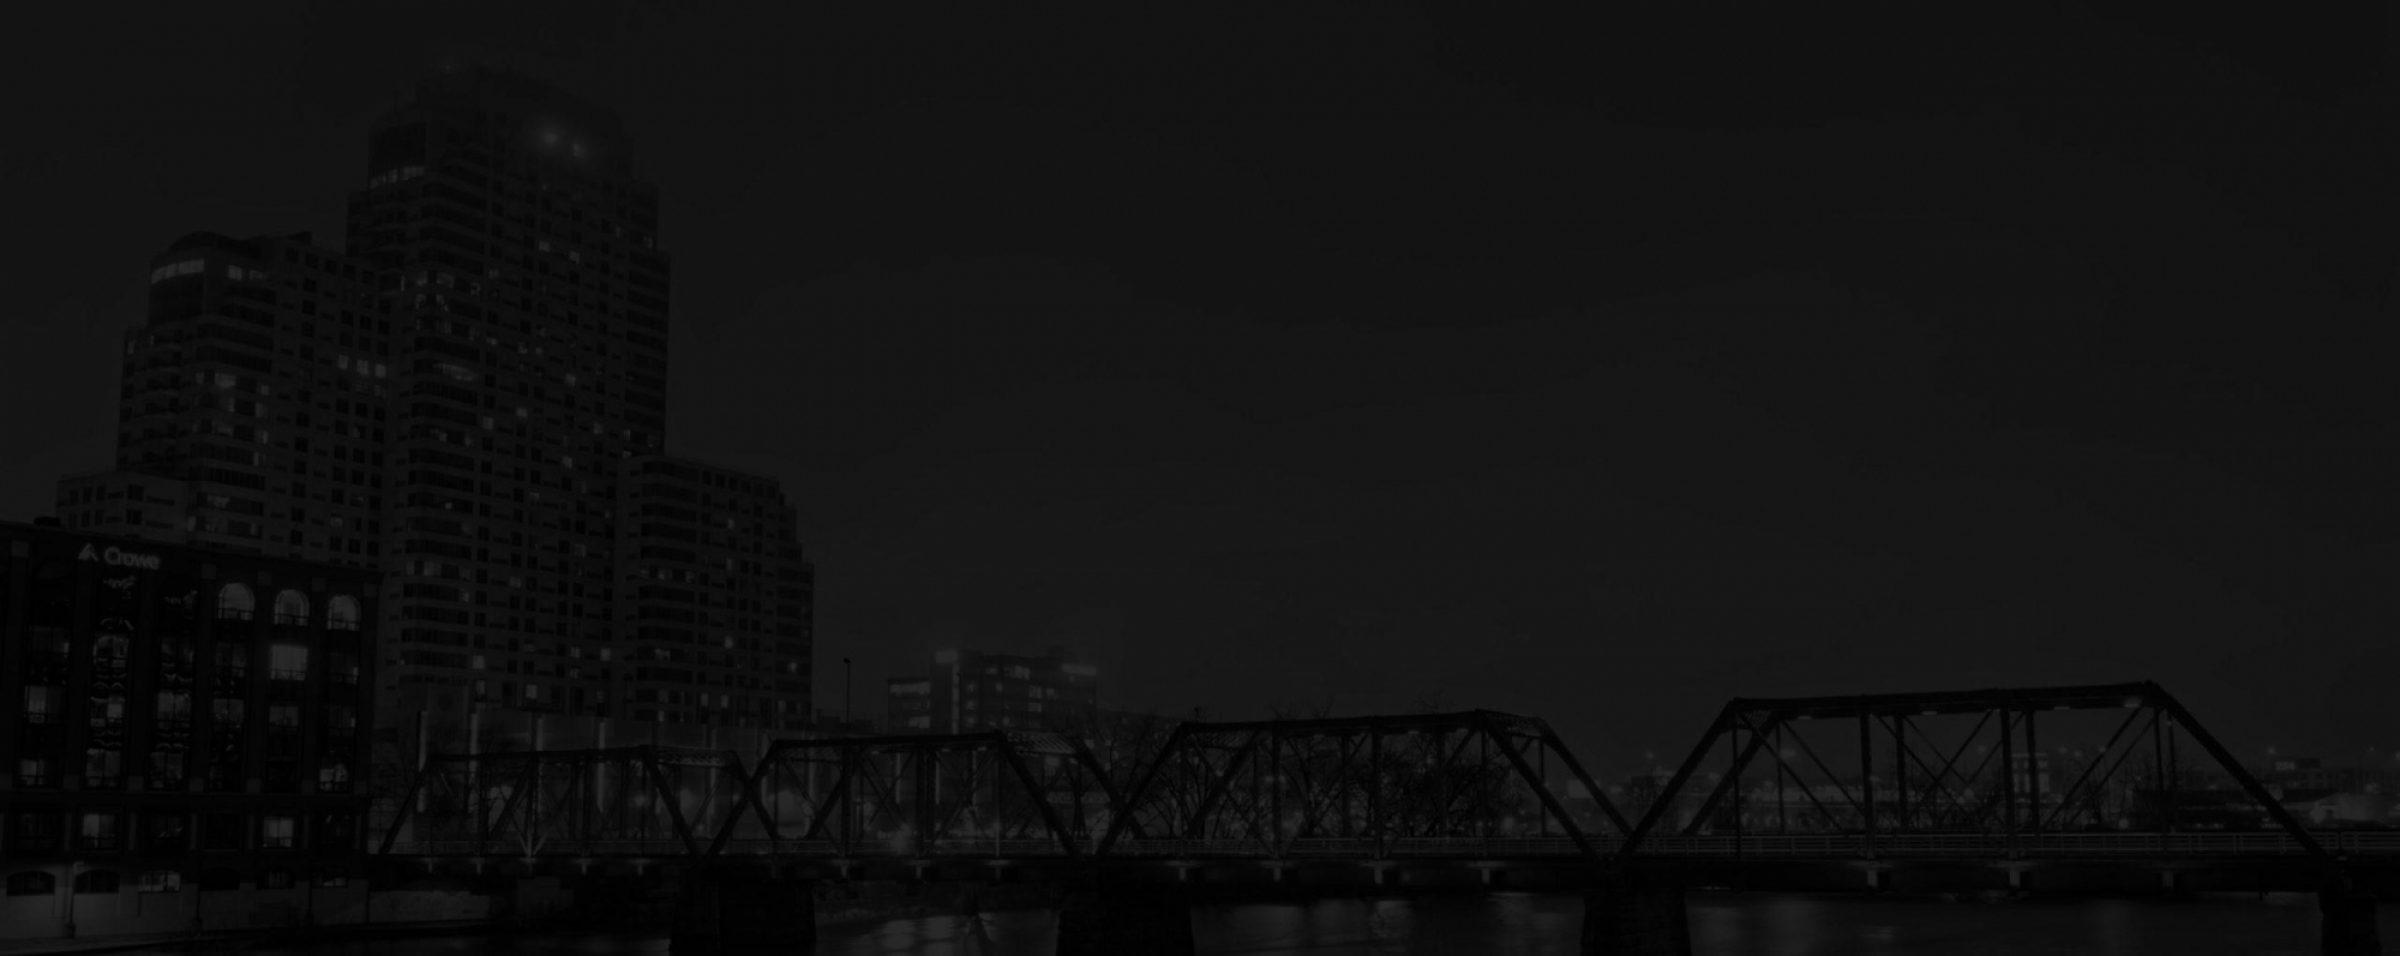 City bg dark footer 2x